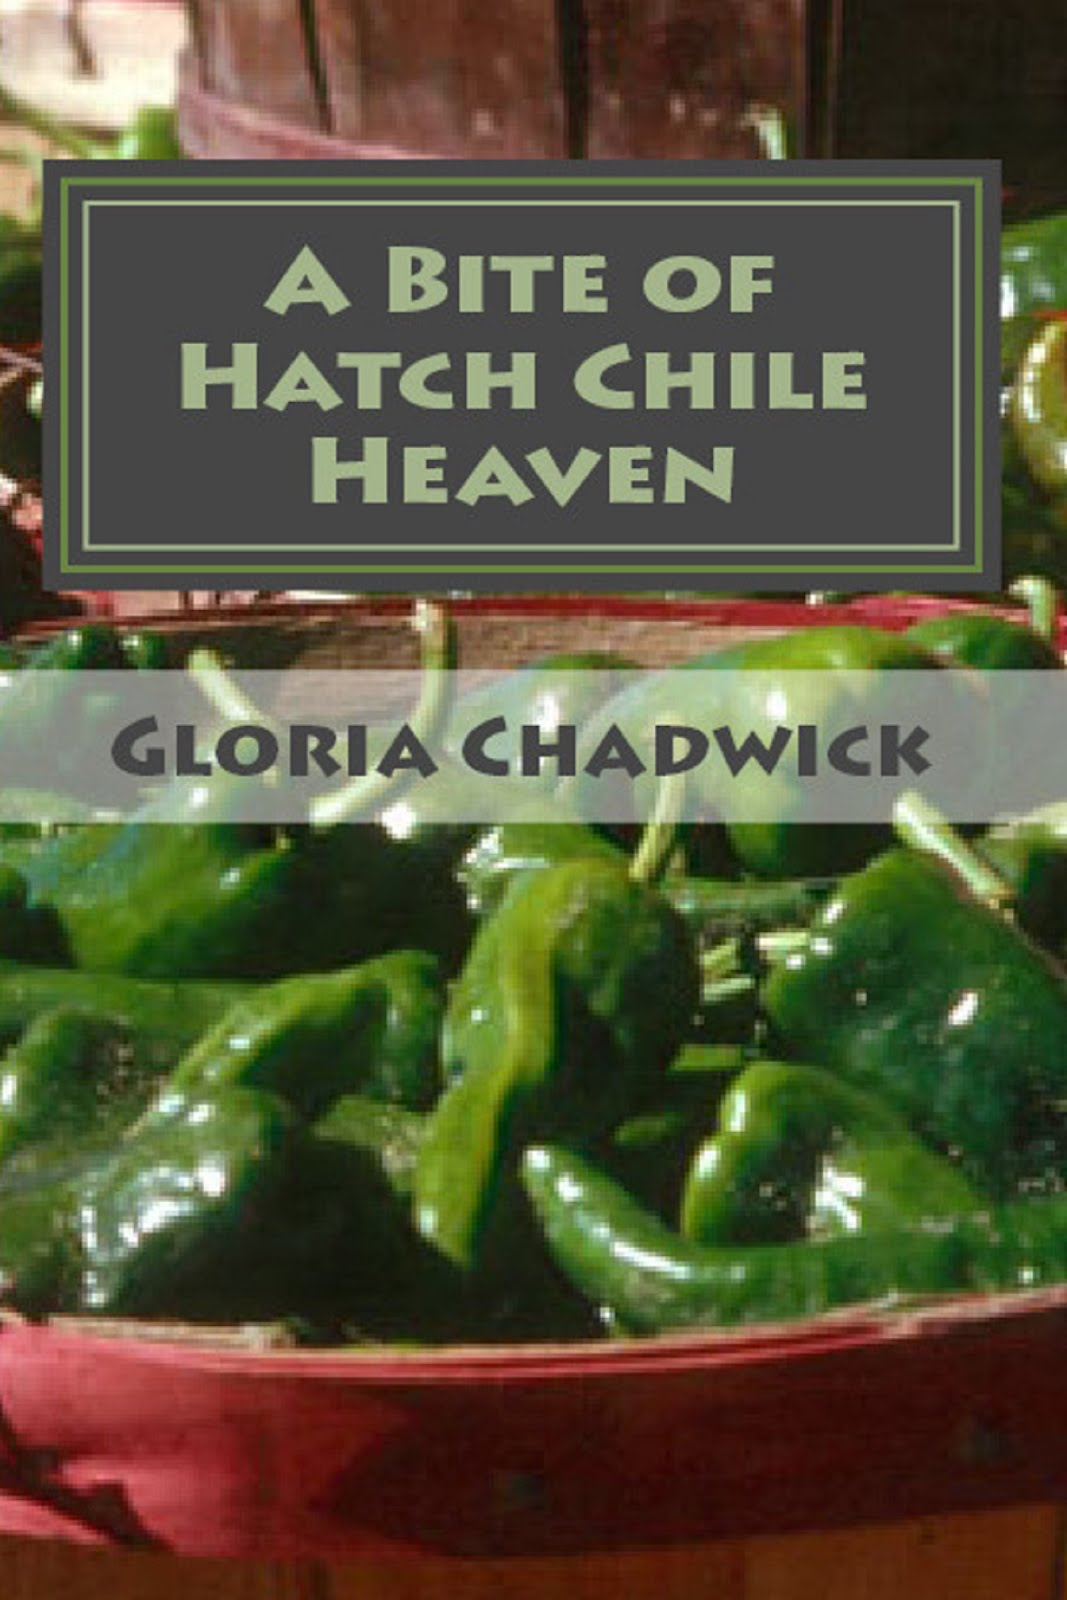 A Bite of Hatch Chile Heaven